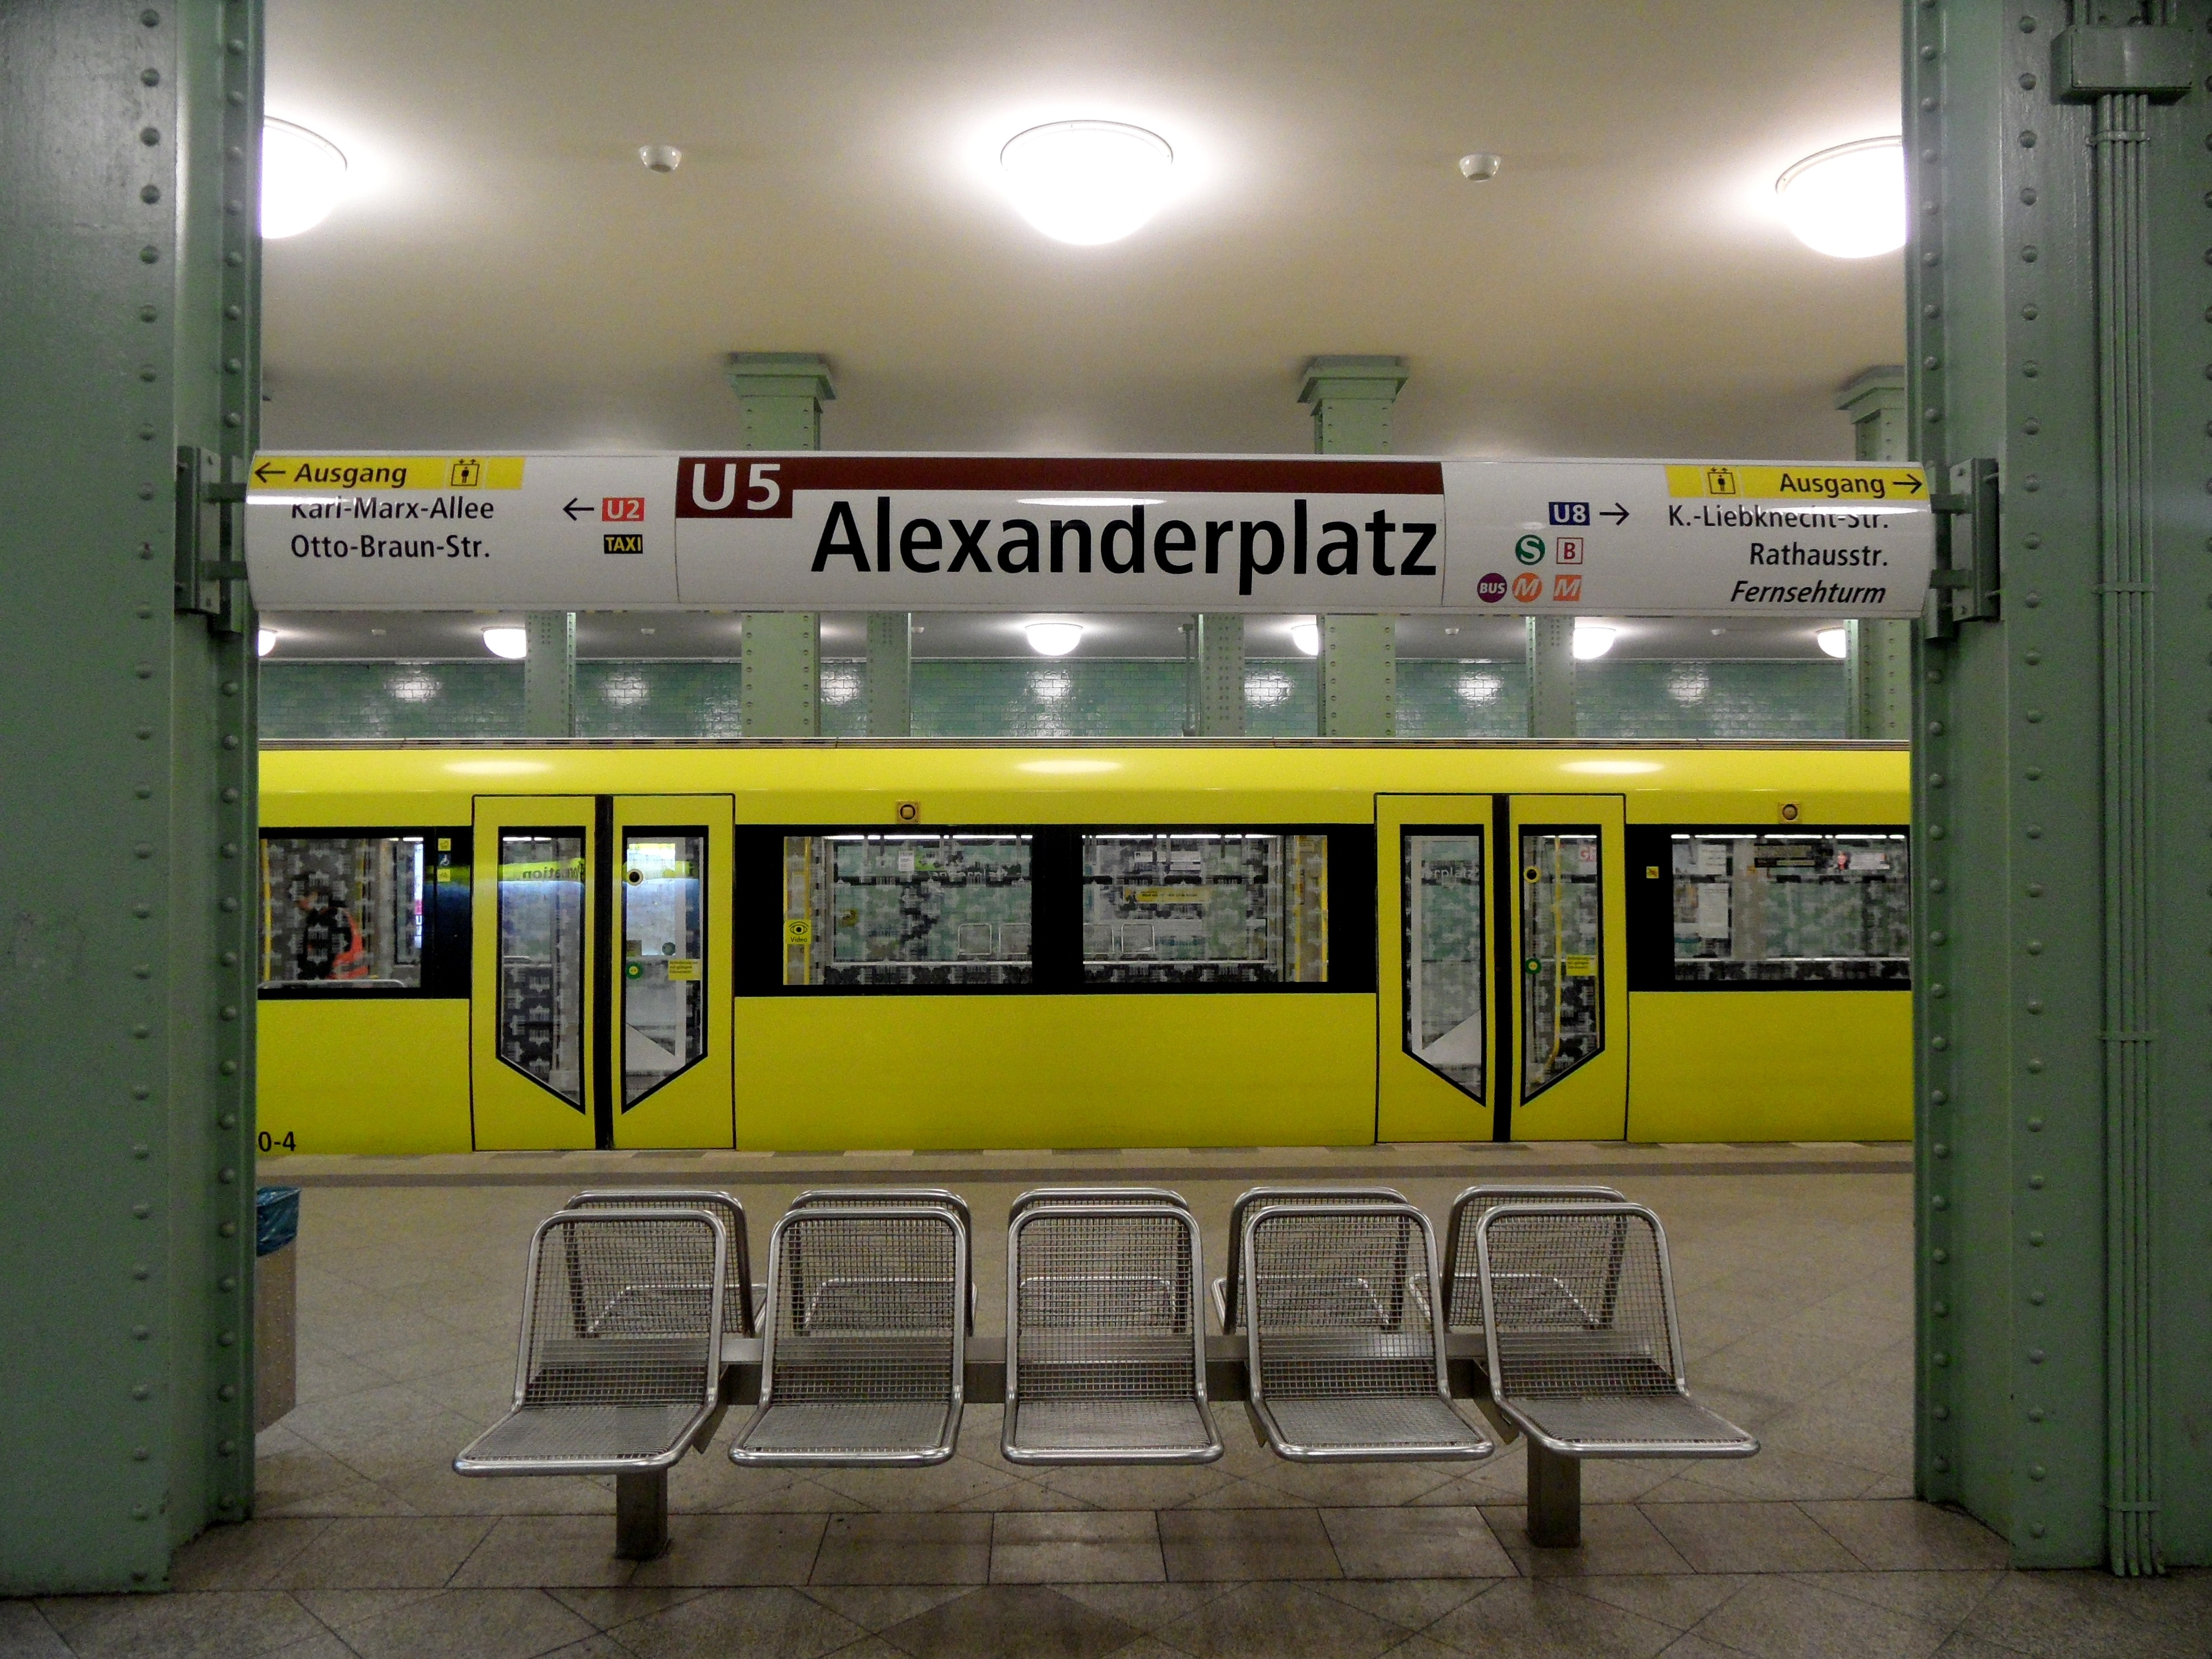 u bahnhof alexanderplatz rome - photo#1